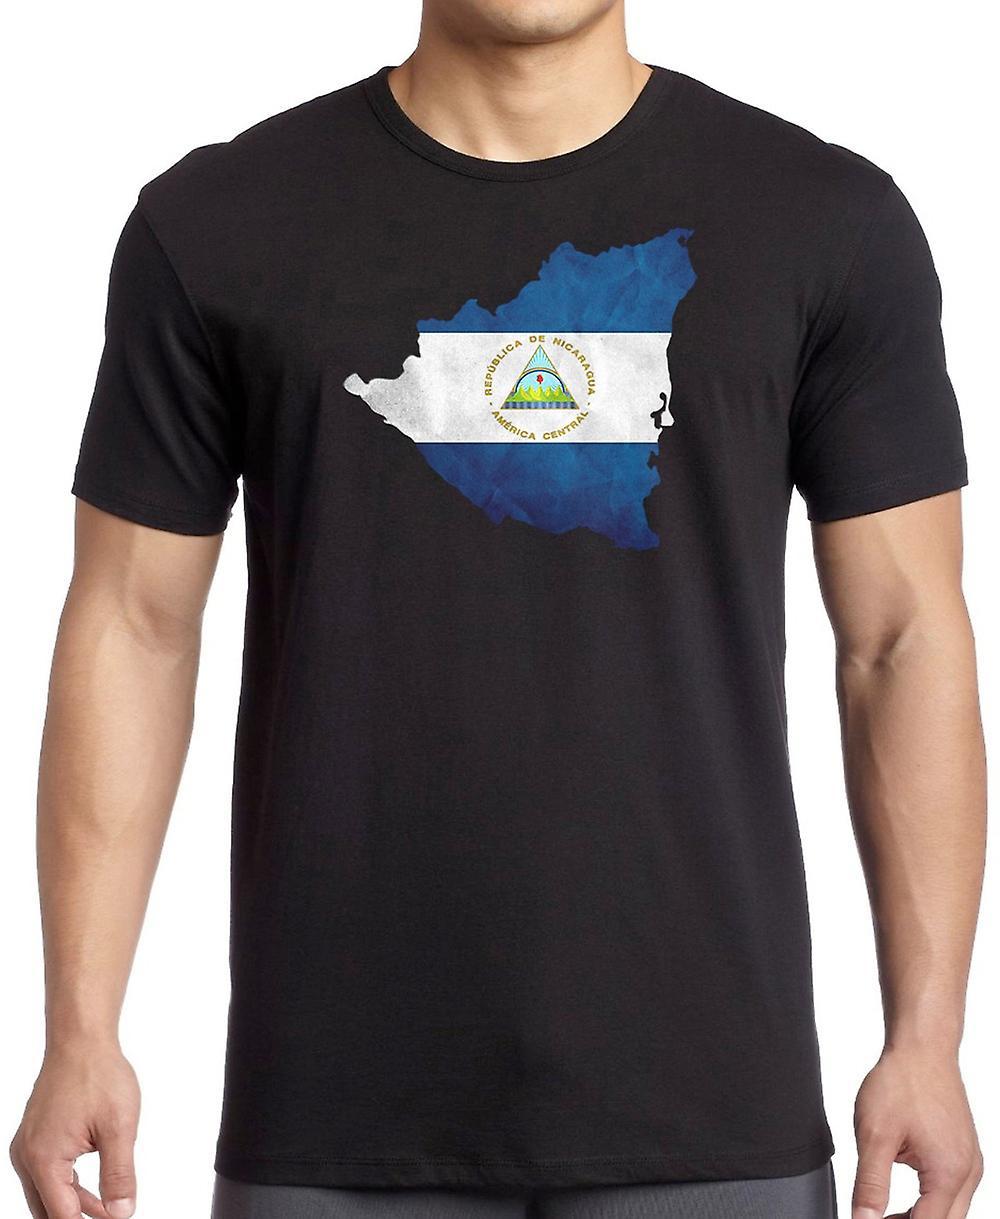 Nicaragua bandera mapa T Shirt - 5xl